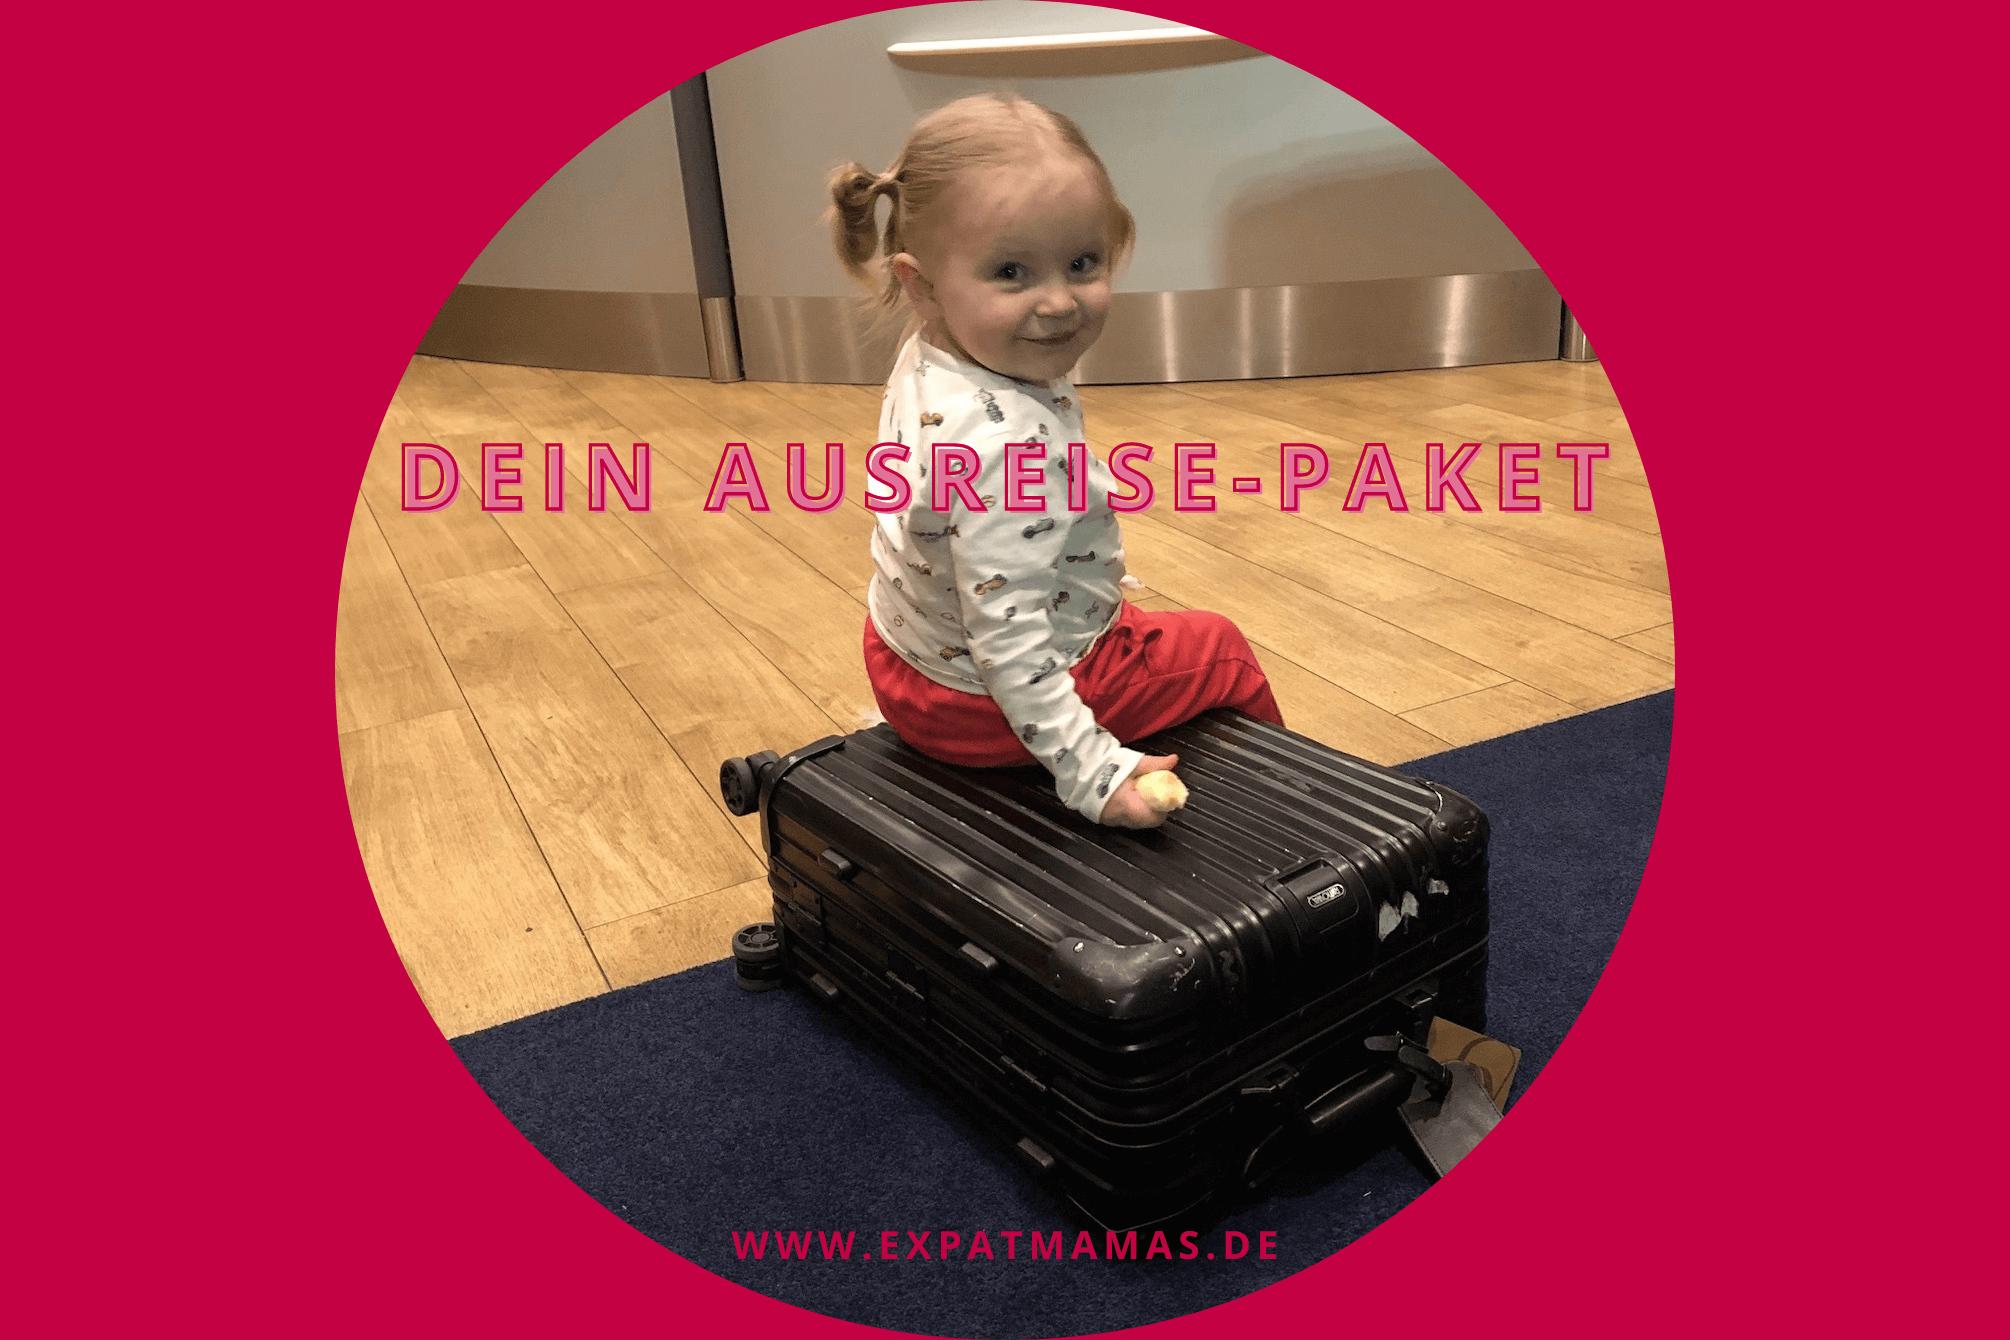 Dein Ausreise Paket www.expatmamas.de/dein-ausreise-paket/ #imauslandzuhause #expatmamas